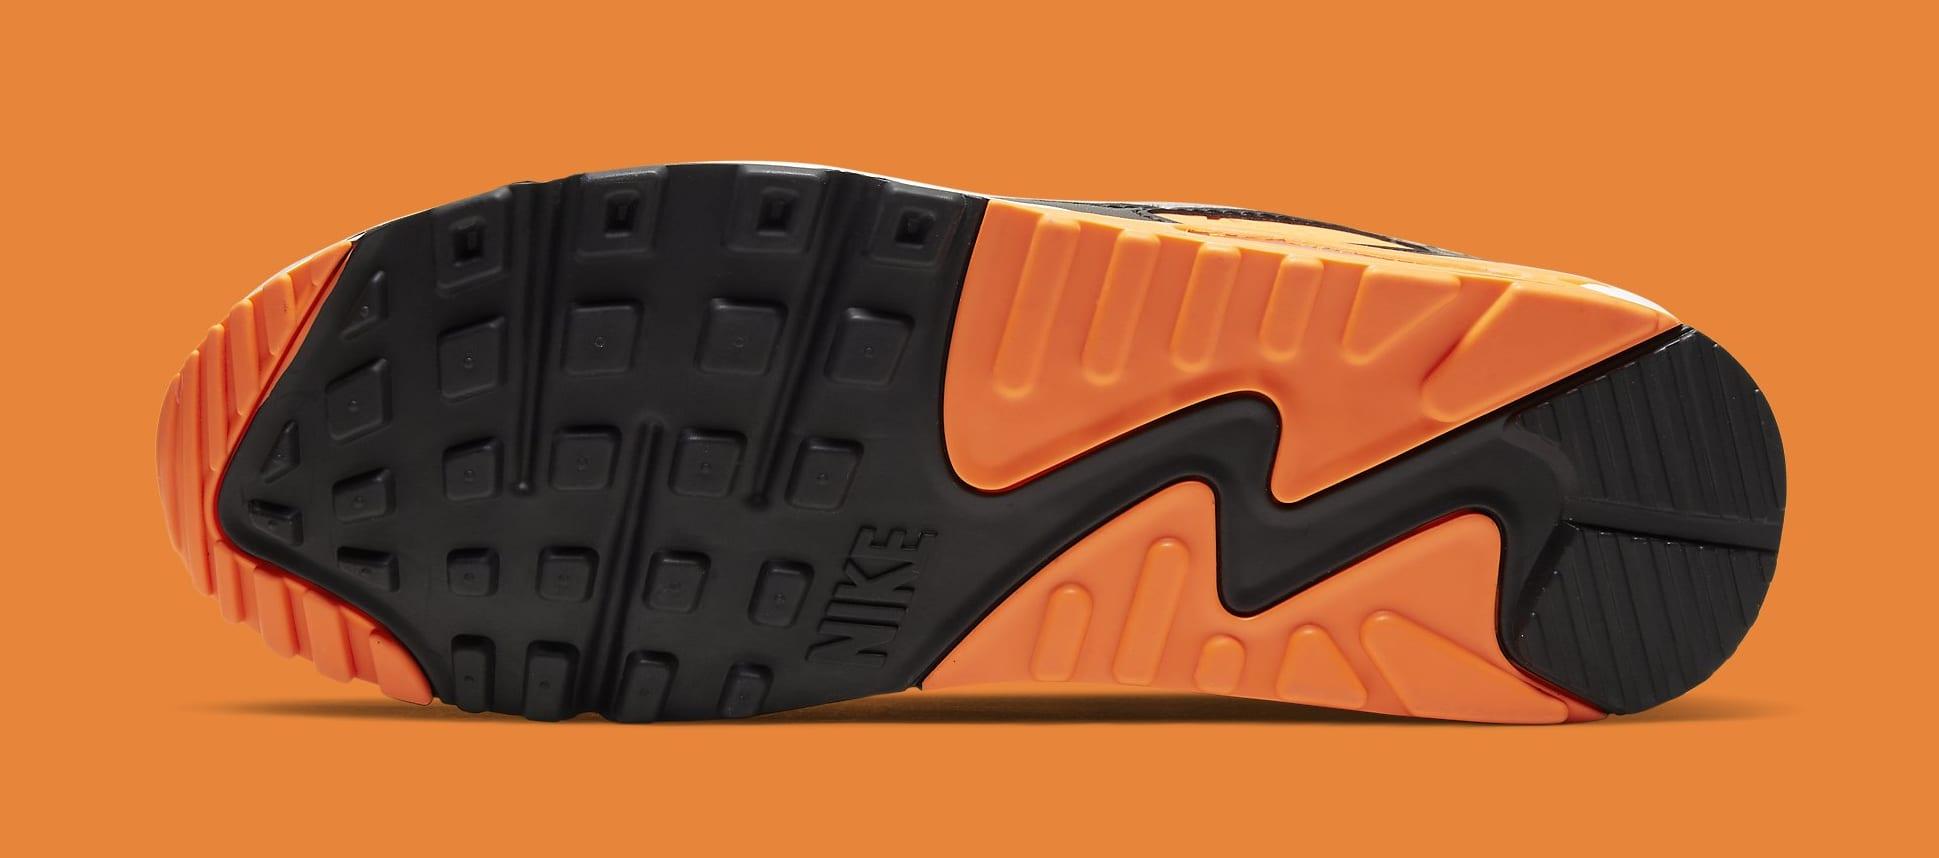 Nike Air Max 90 'Total Orange' CW5458-101 Outsole